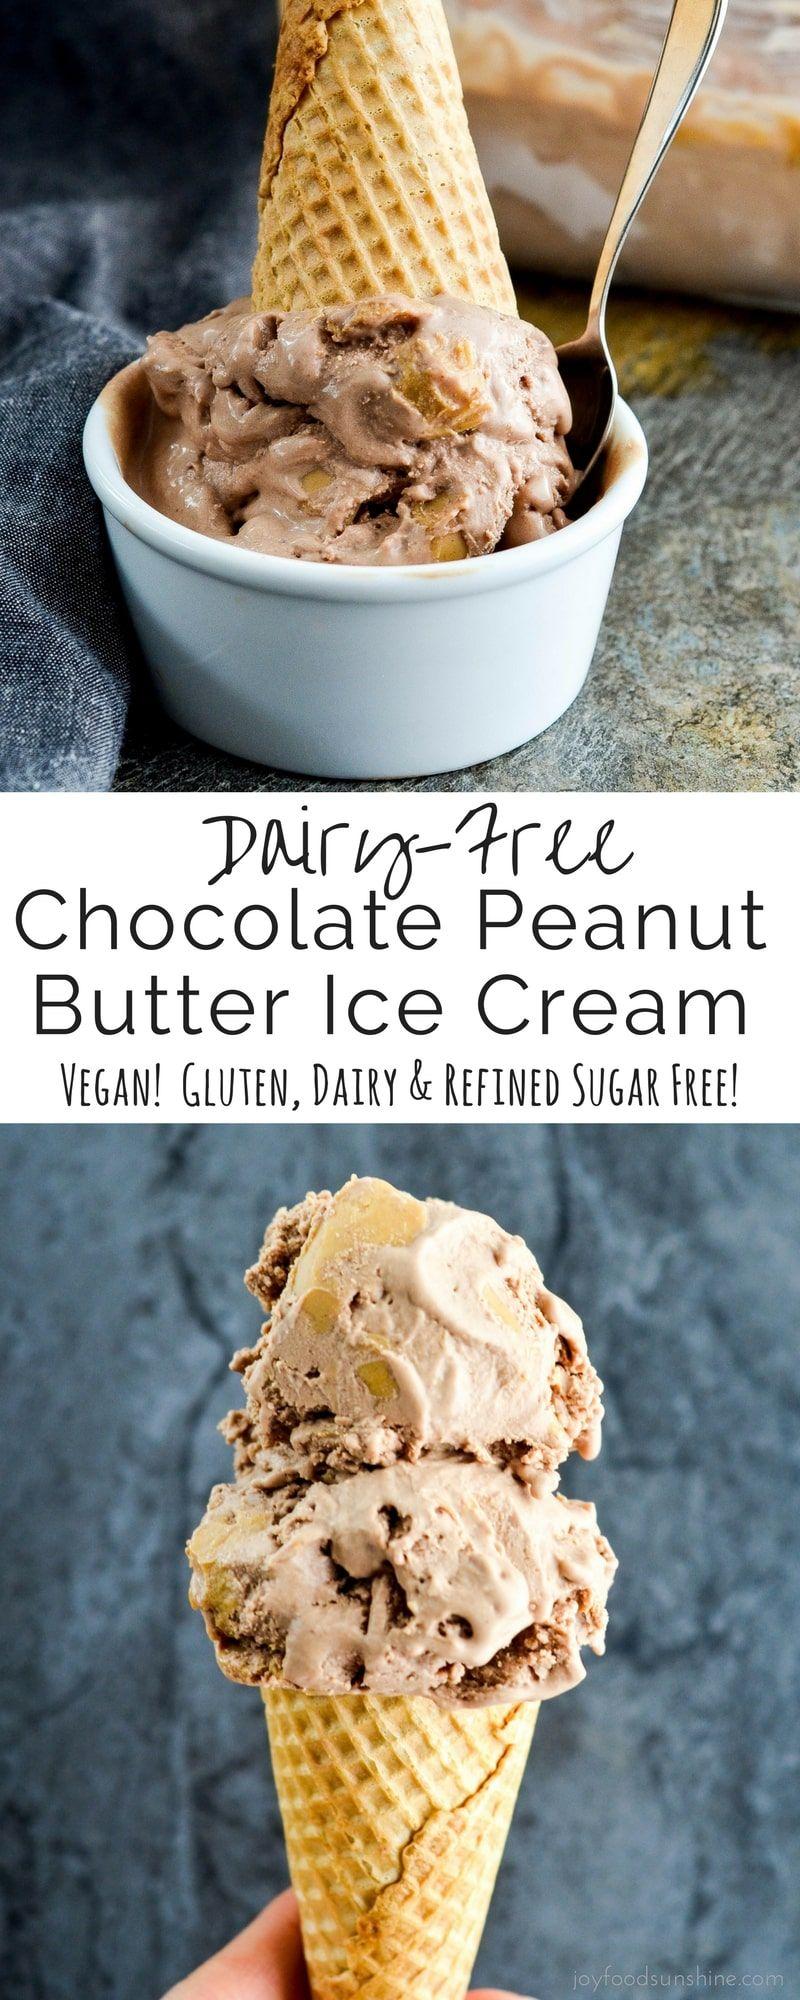 Dairyfree chocolate peanut butter ice cream a healthy